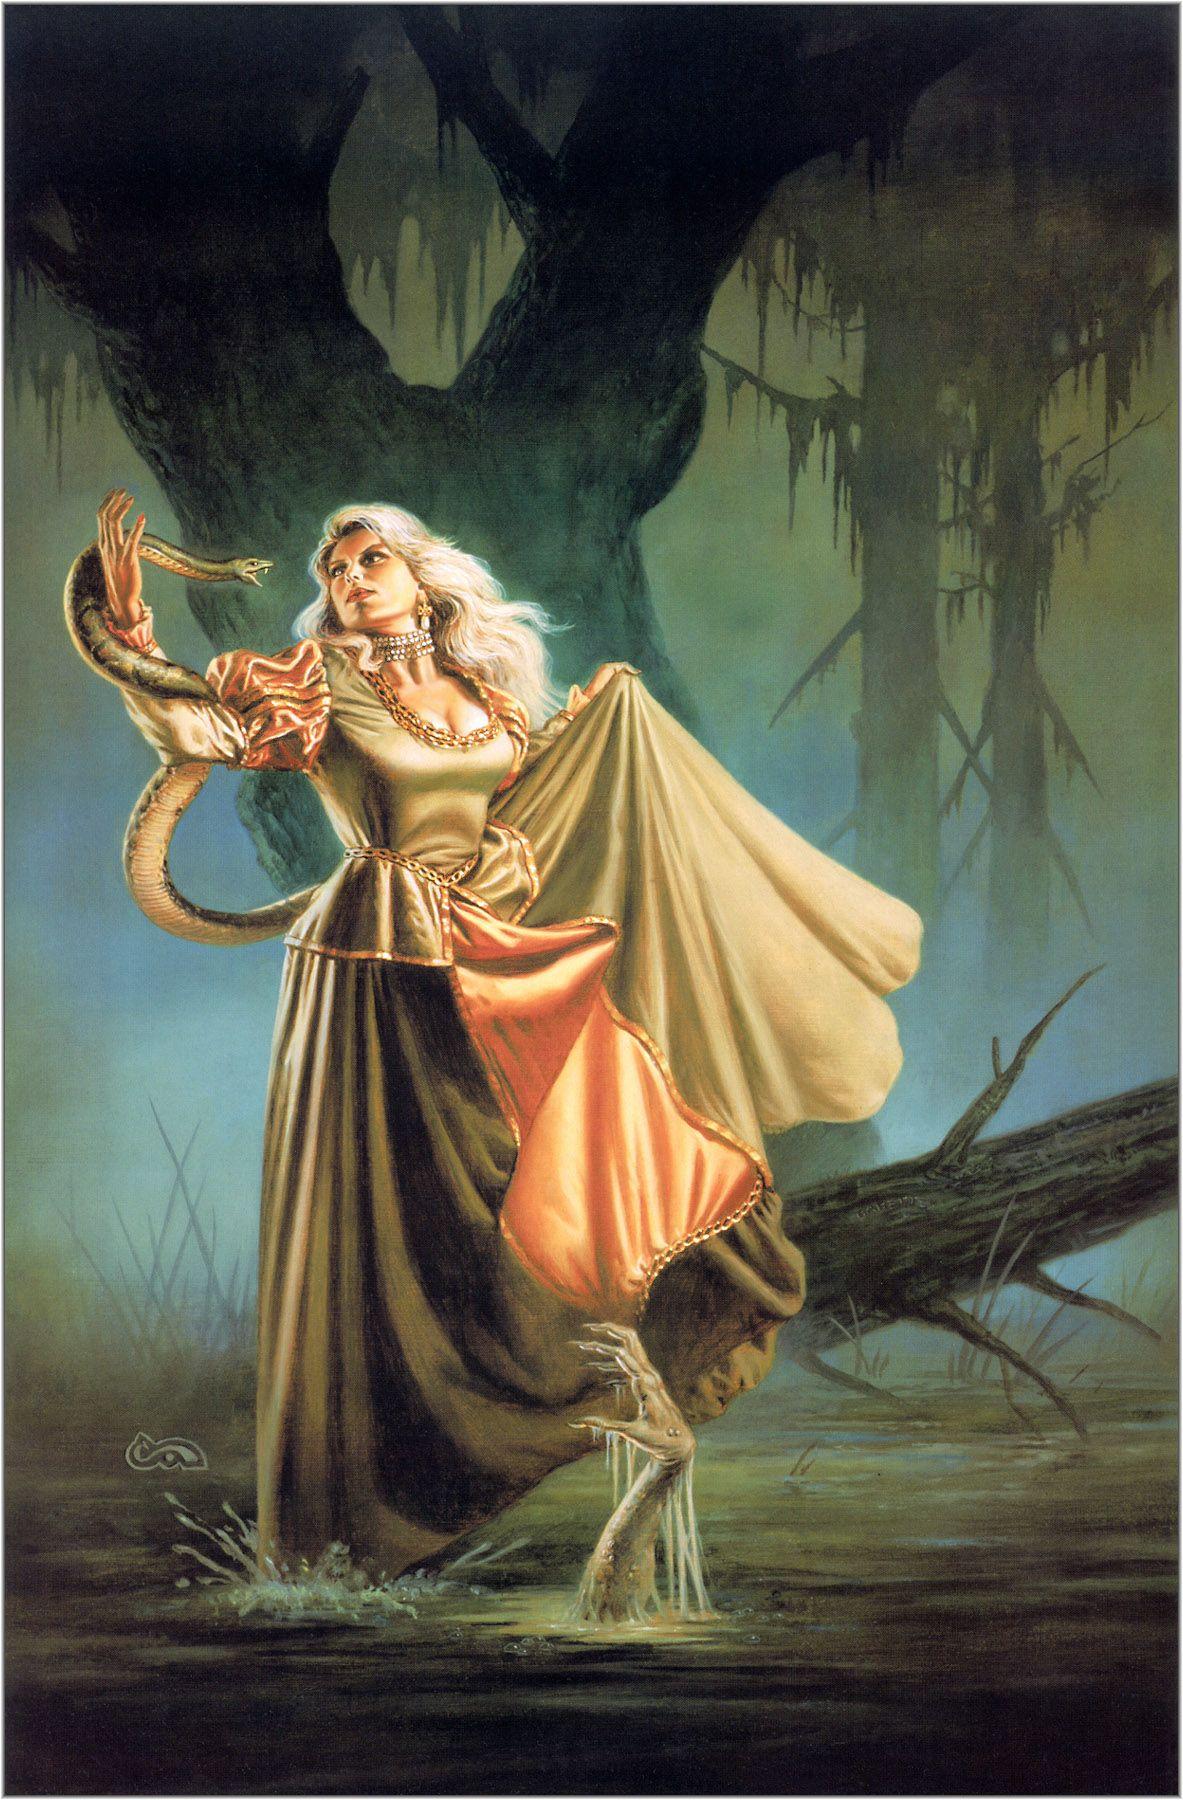 Dance Of The Dead (Ravenloft #3) - Clyde Caldwell